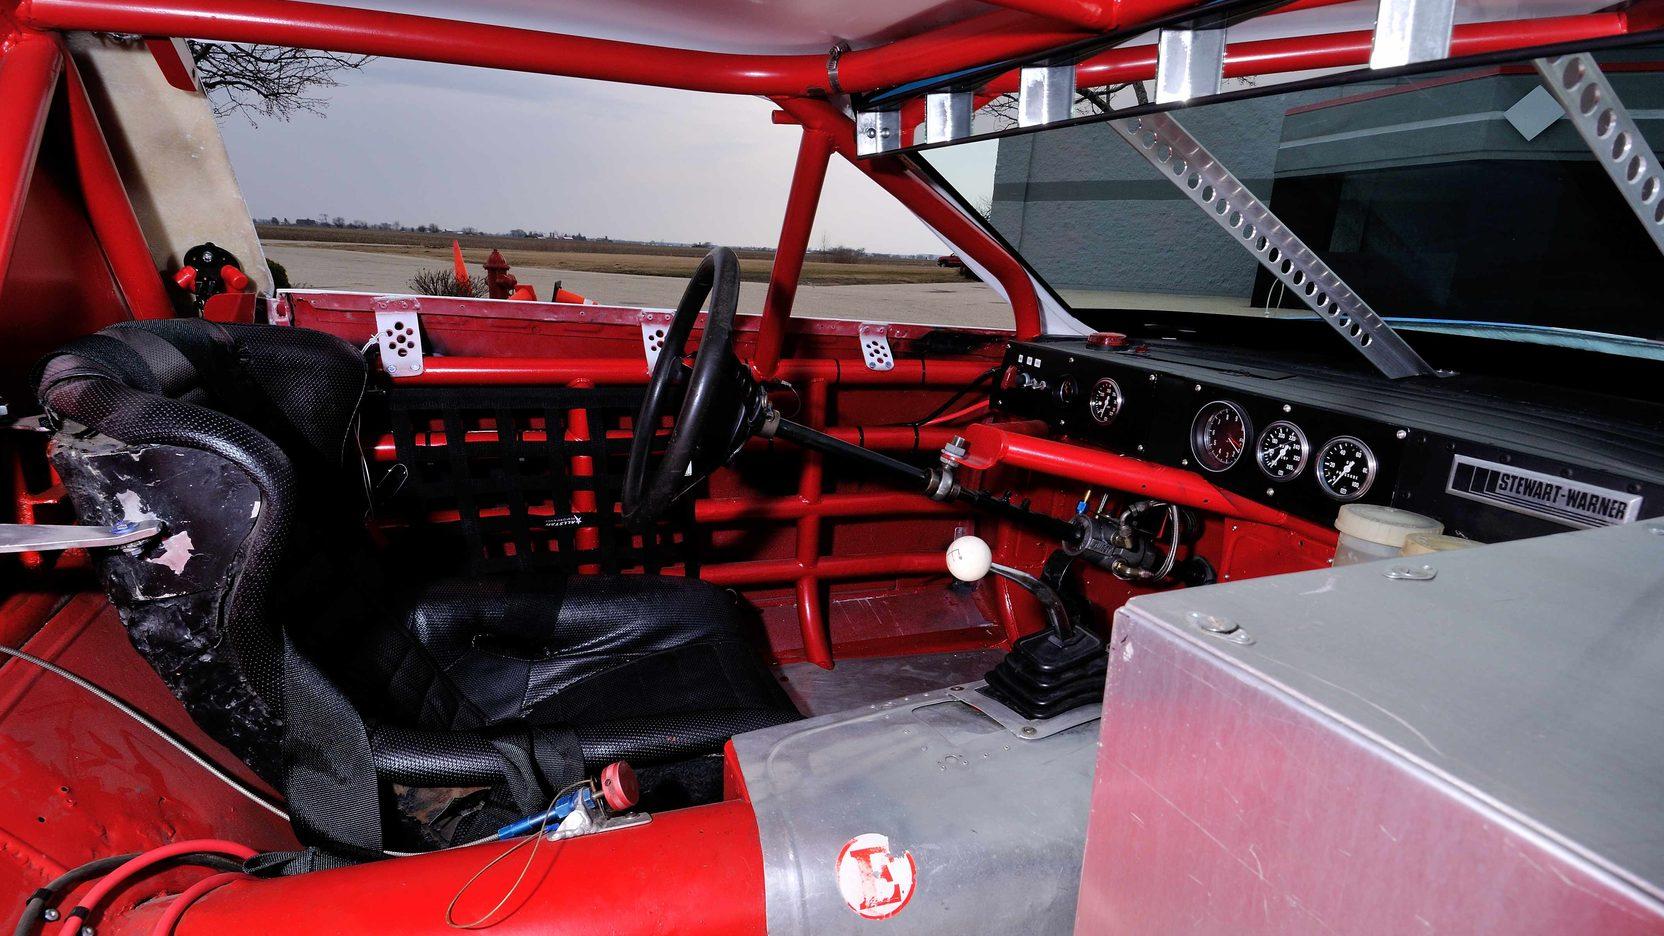 1982 Chevrolet Camaro Le Mans Race Car interior